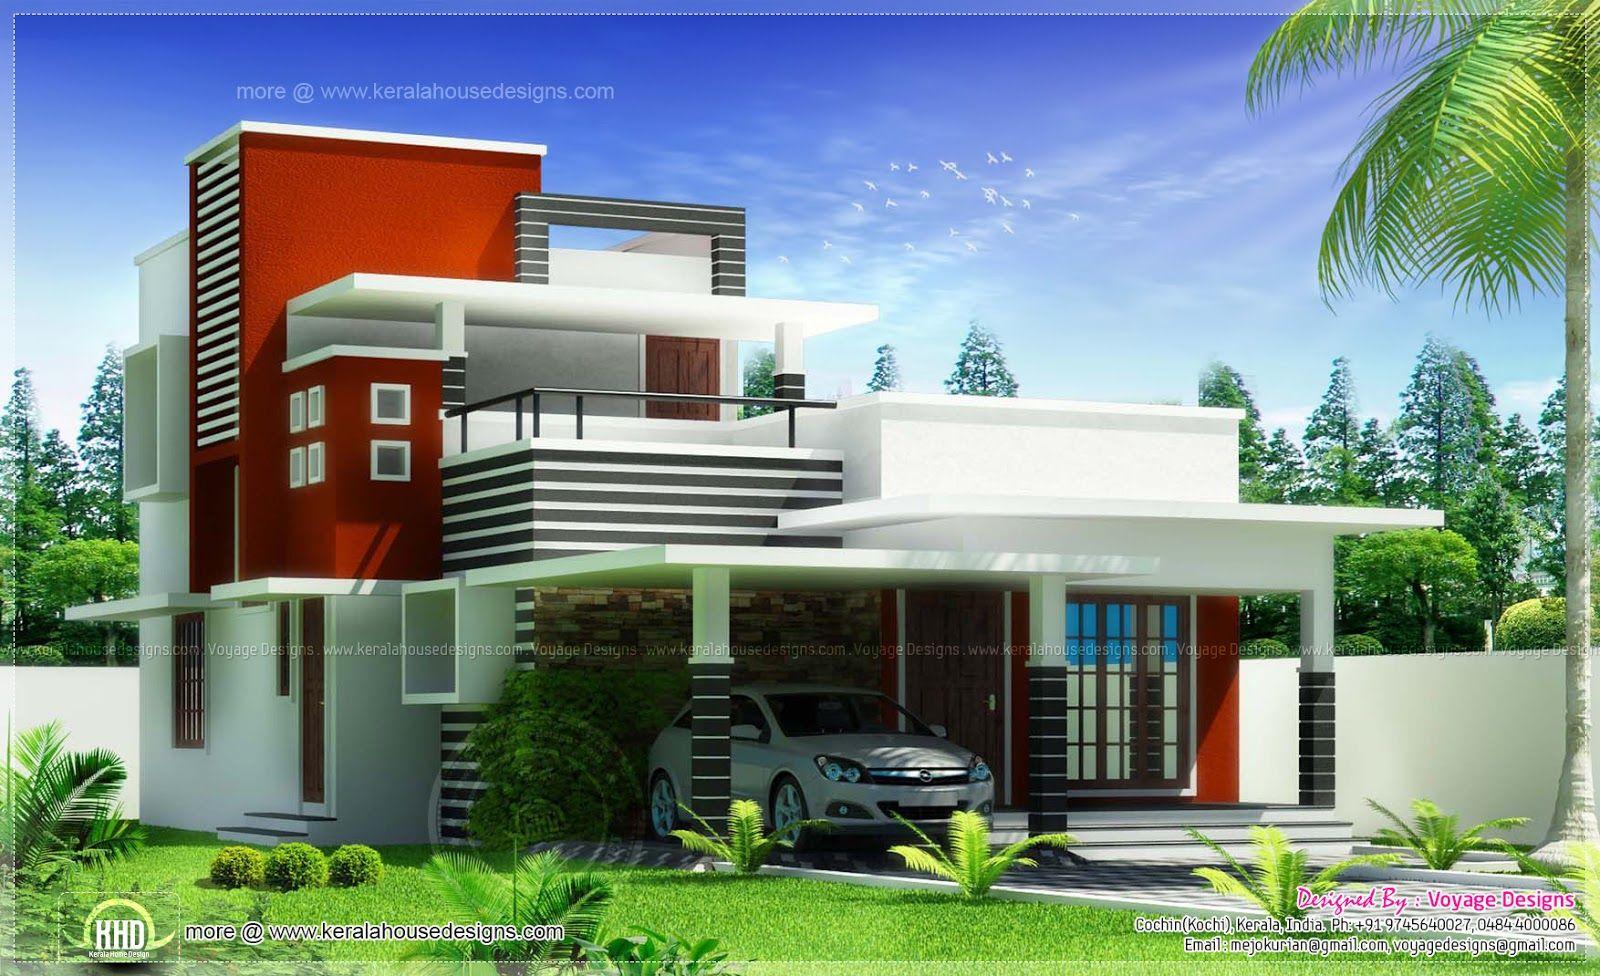 Kerala House Designs Architecture Kerala House Design